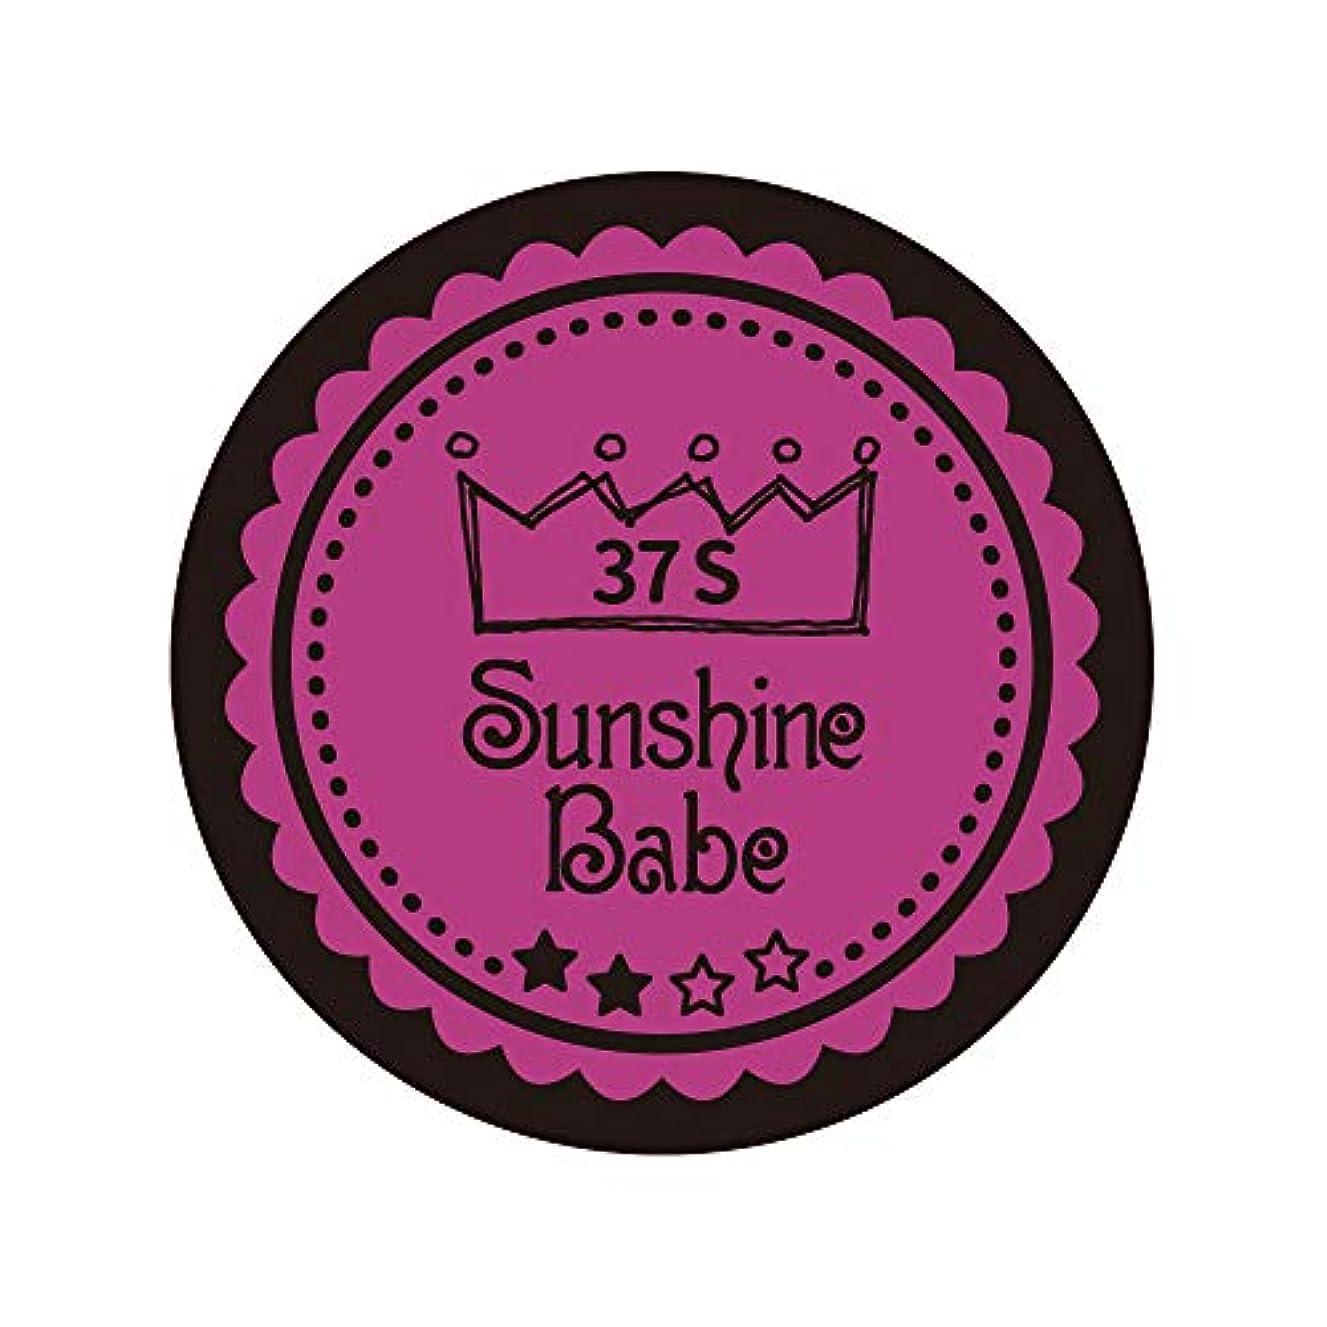 Sunshine Babe カラージェル 37S フューシャピンク 4g UV/LED対応